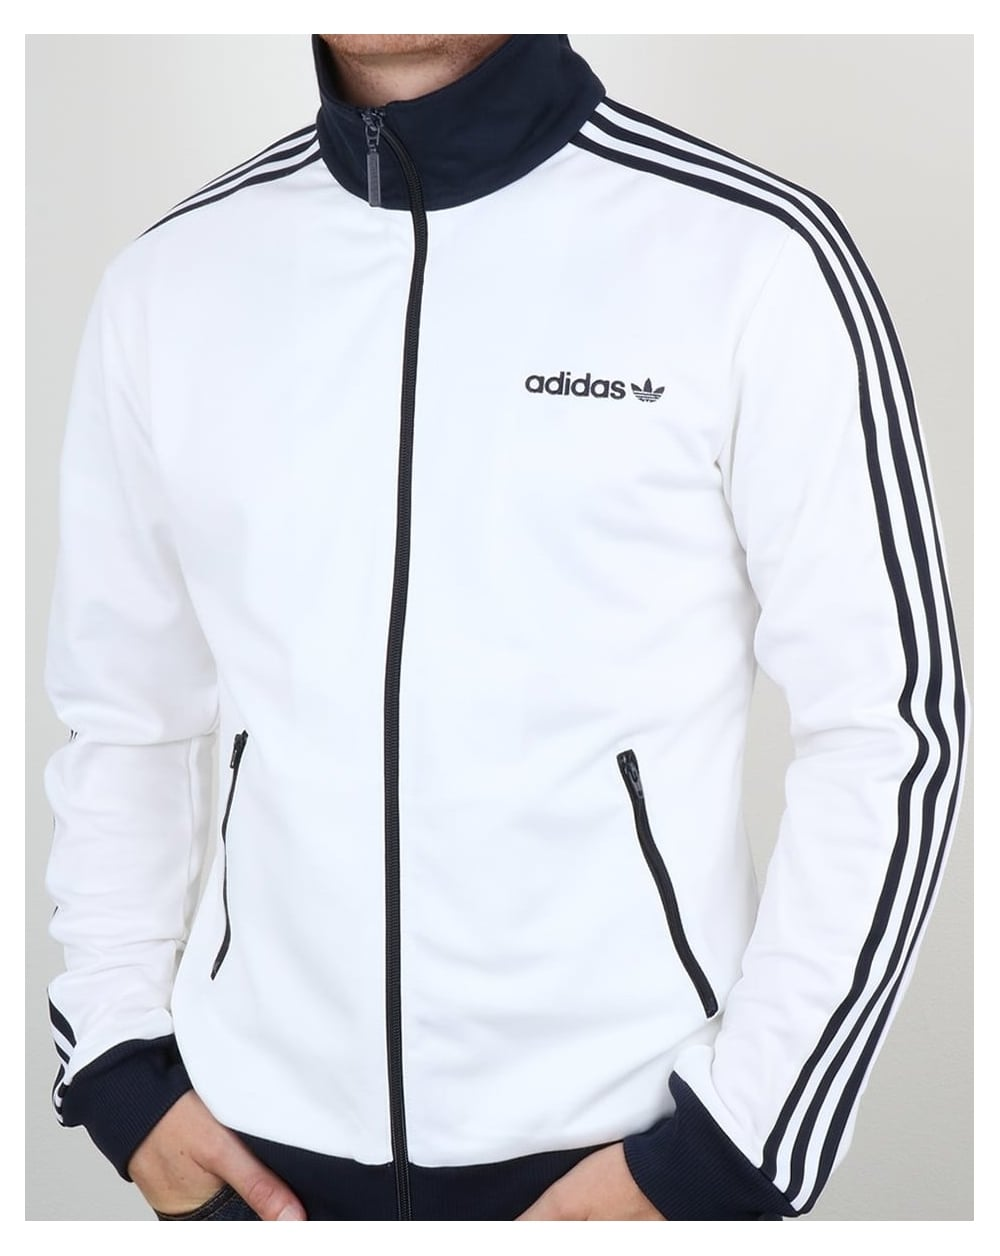 Adidas Top Ten Hi Sleek Bow Zip Trainers: Adidas Beckenbauer, Track Top, White, Navy, Jacket